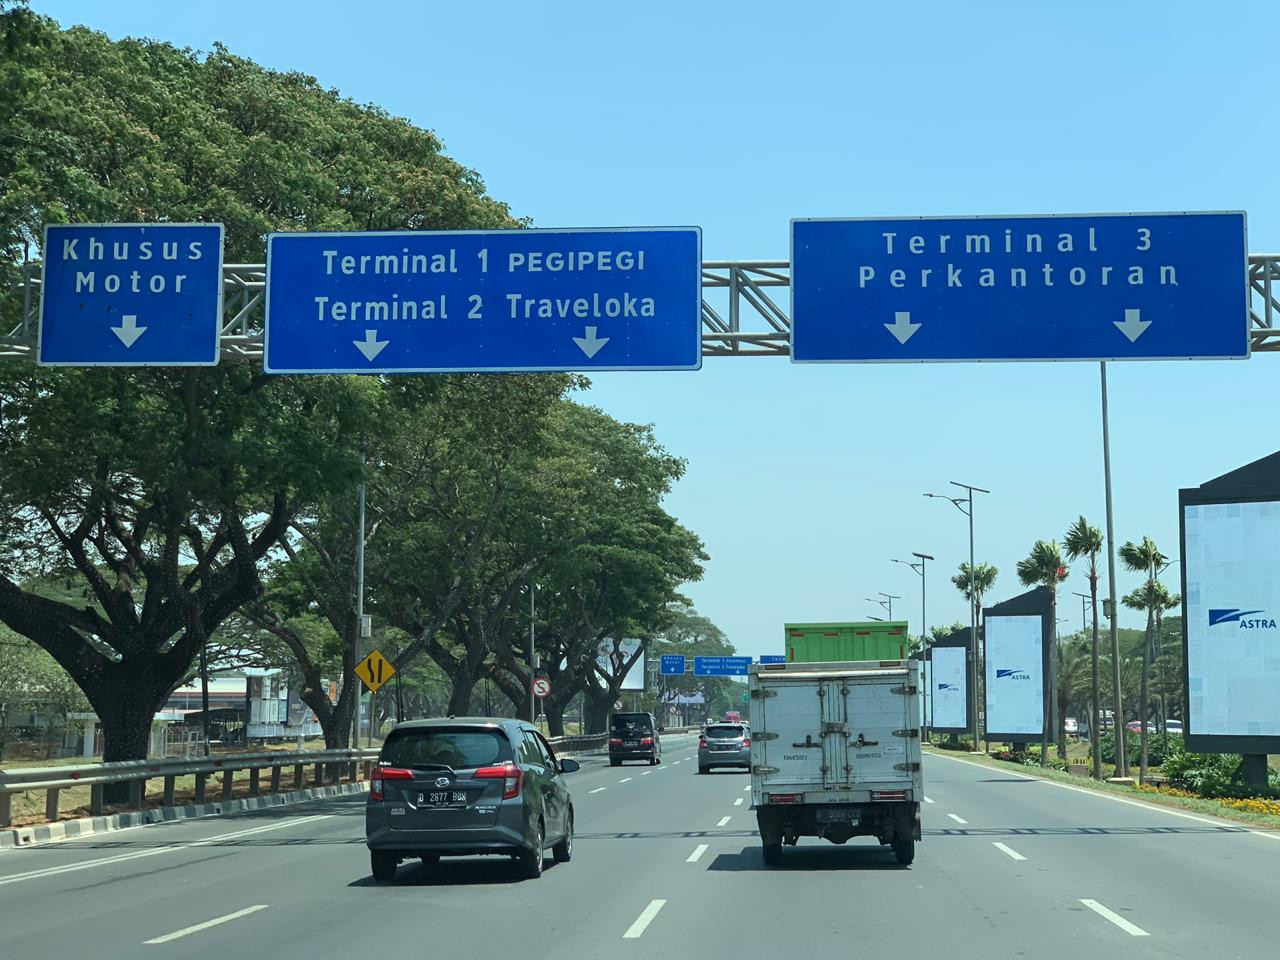 Confusion arises over Traveloka's co-branding program at Soekarno-Hatta airport